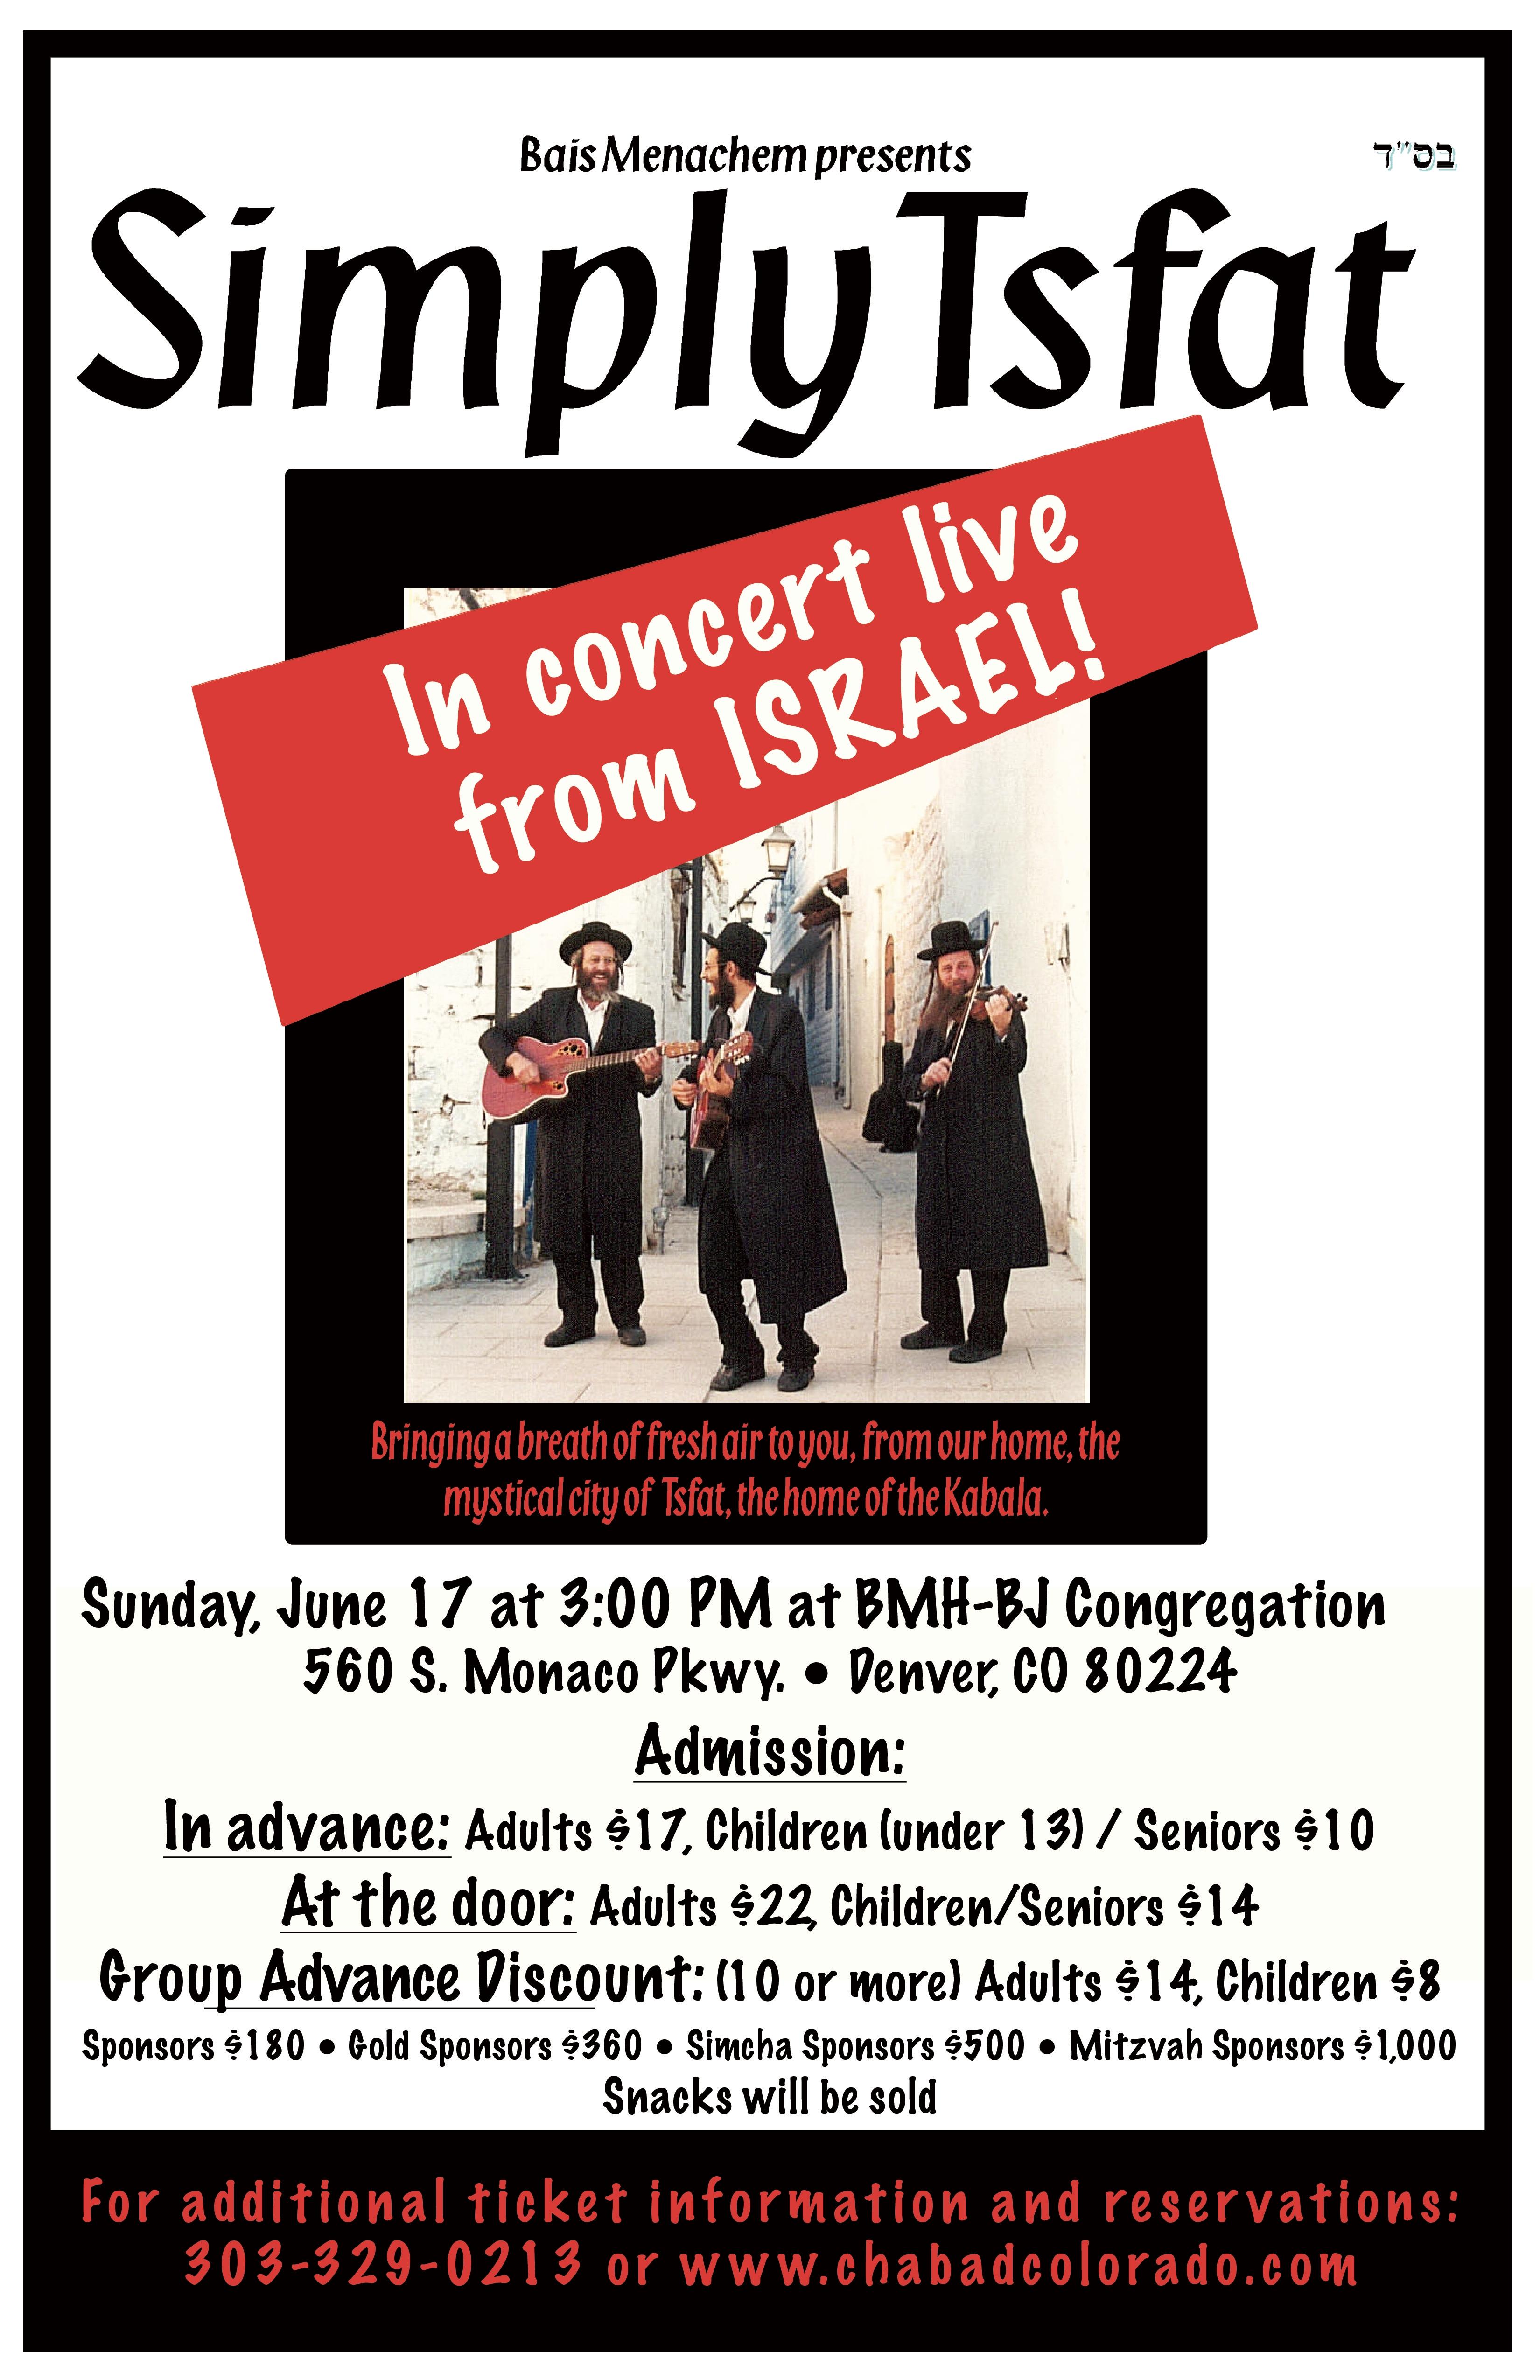 BMHBJ Concert 11x17 5-2-18-page-0 (1).jpg